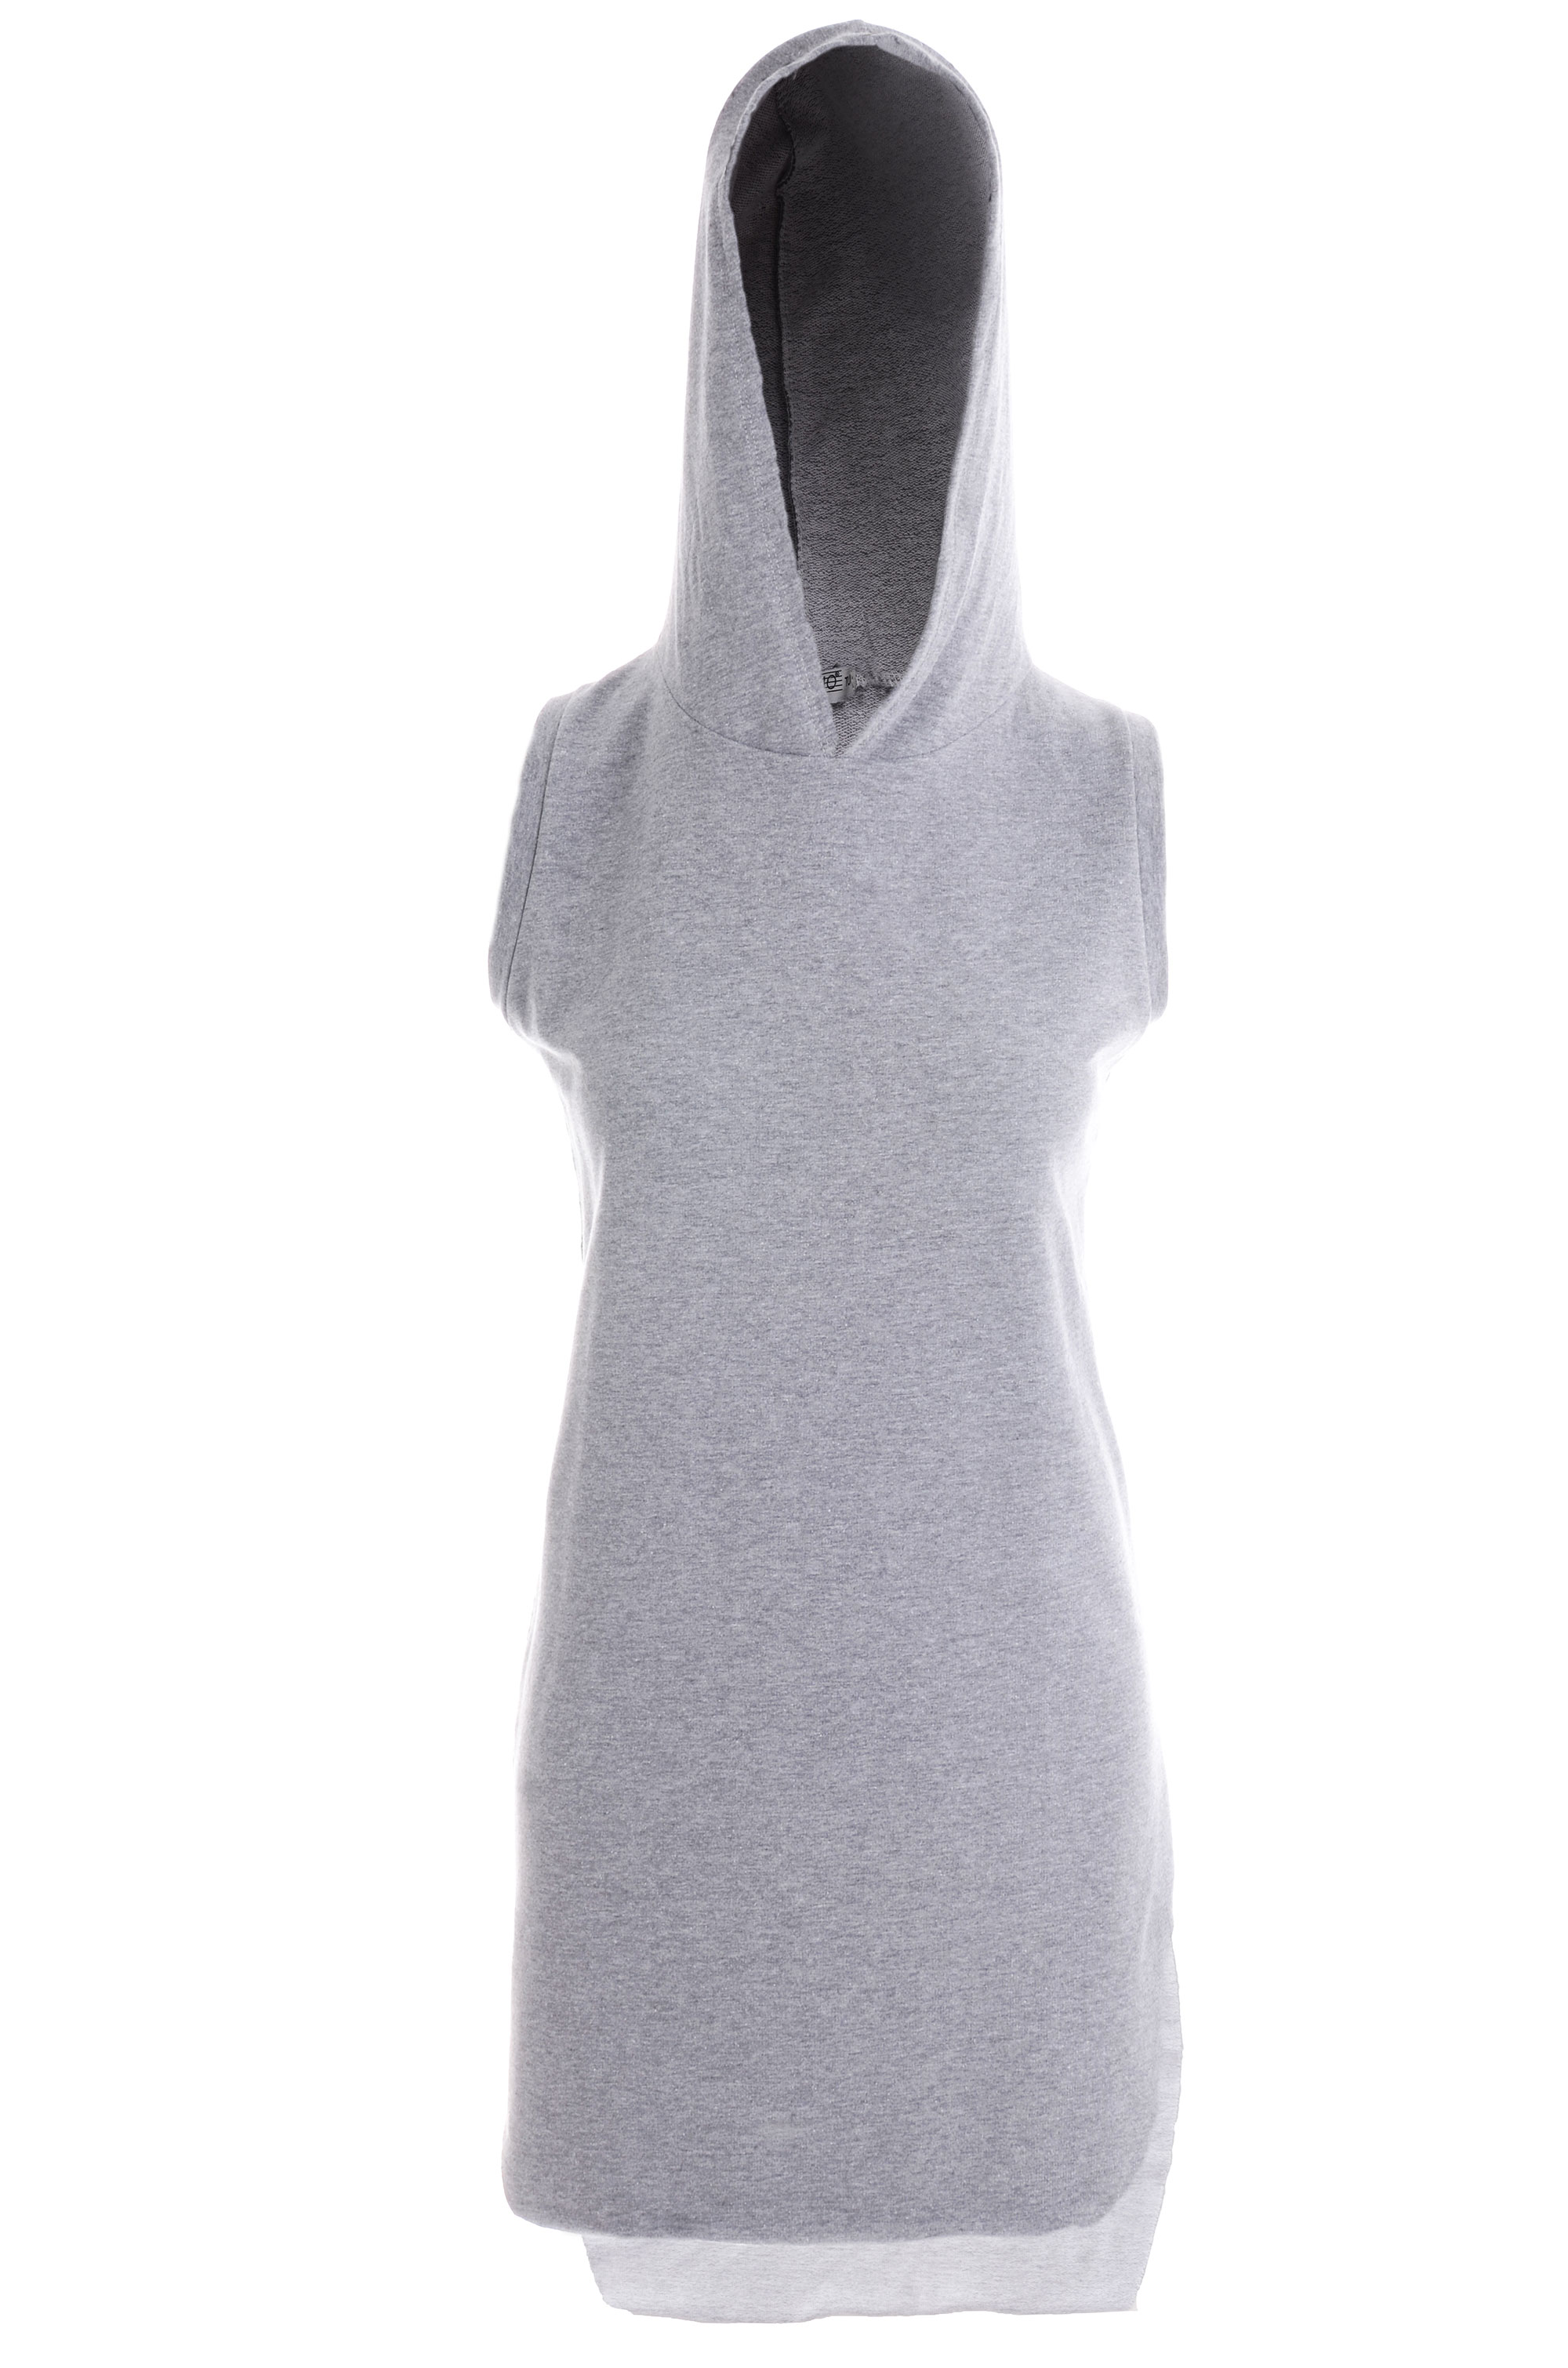 Sukienka - 59-80069 GRIG - Unisono